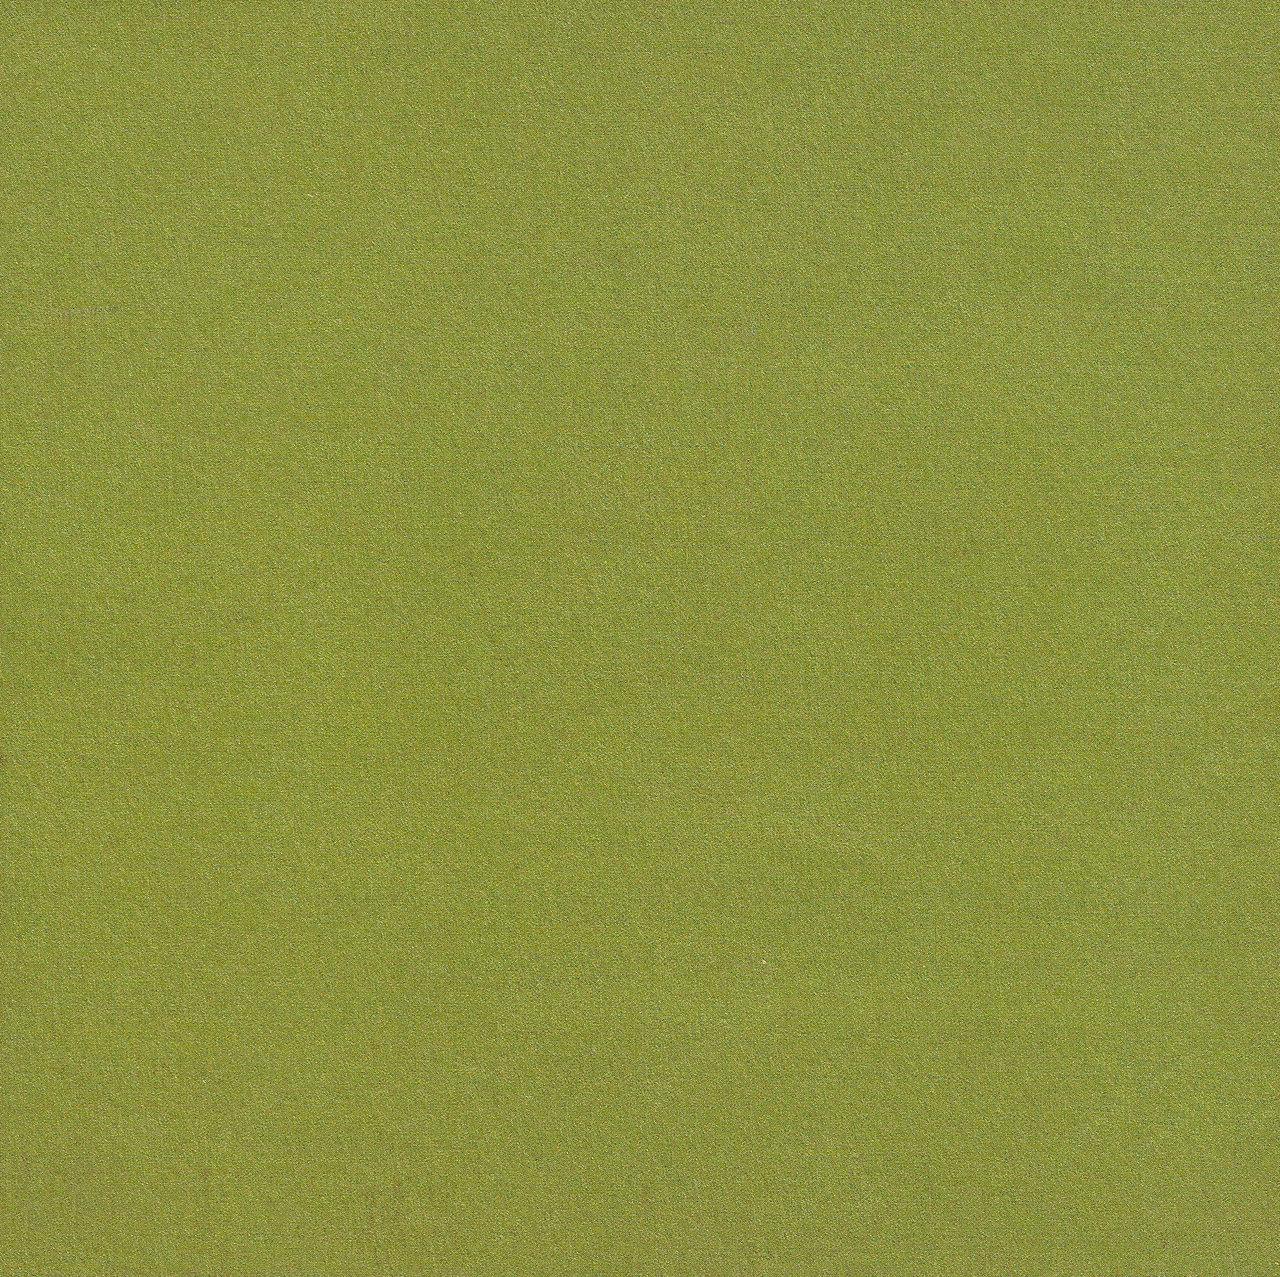 Green Desktop Wallpaper: Olive Green Desktop Wallpaper